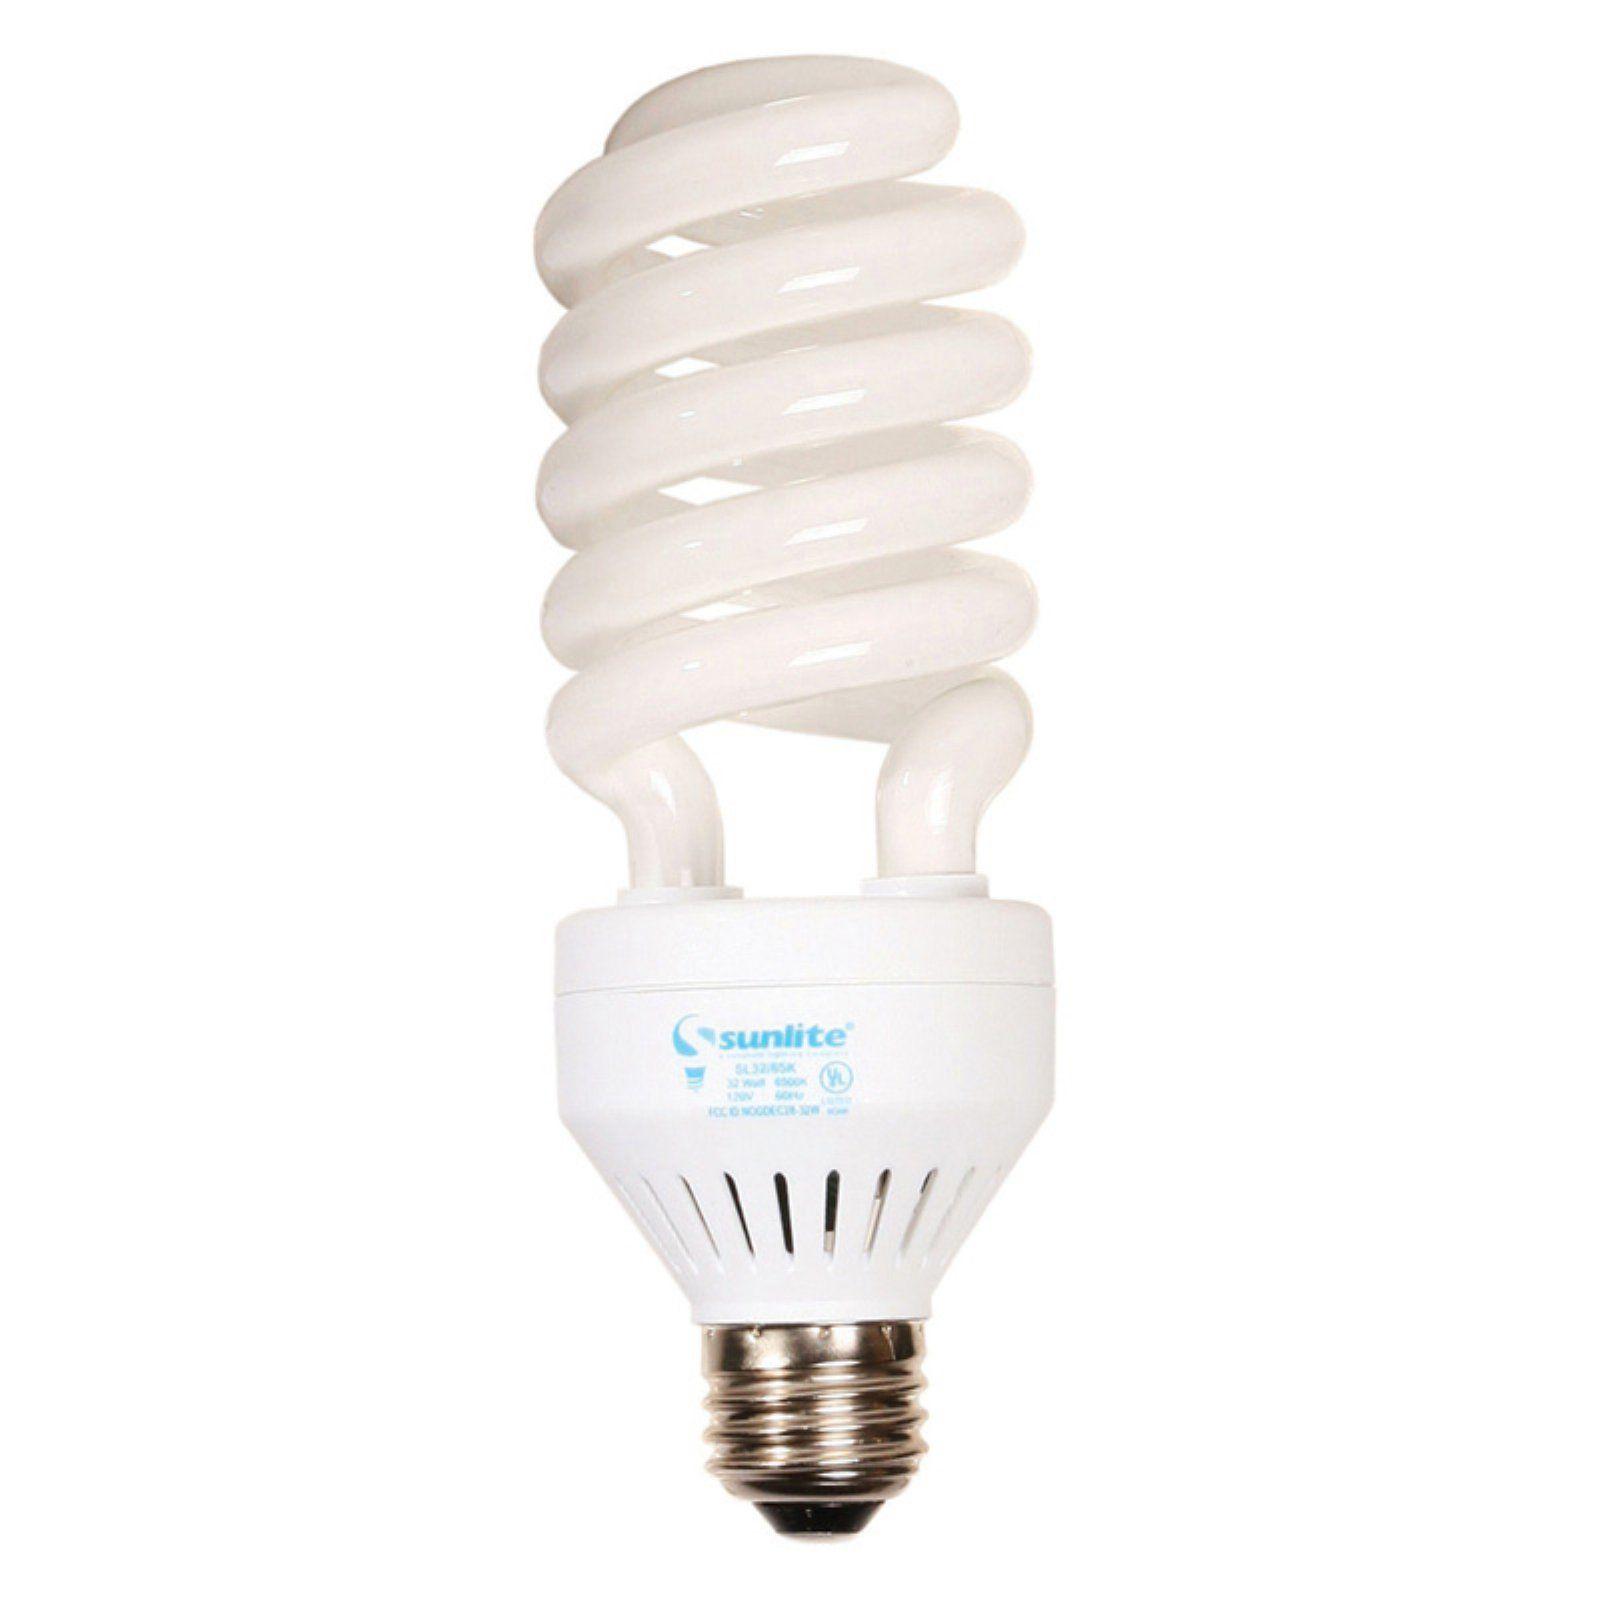 Dayspot Cfl 32w 65k Equivalent To 150w Fluorescent Light Bulb